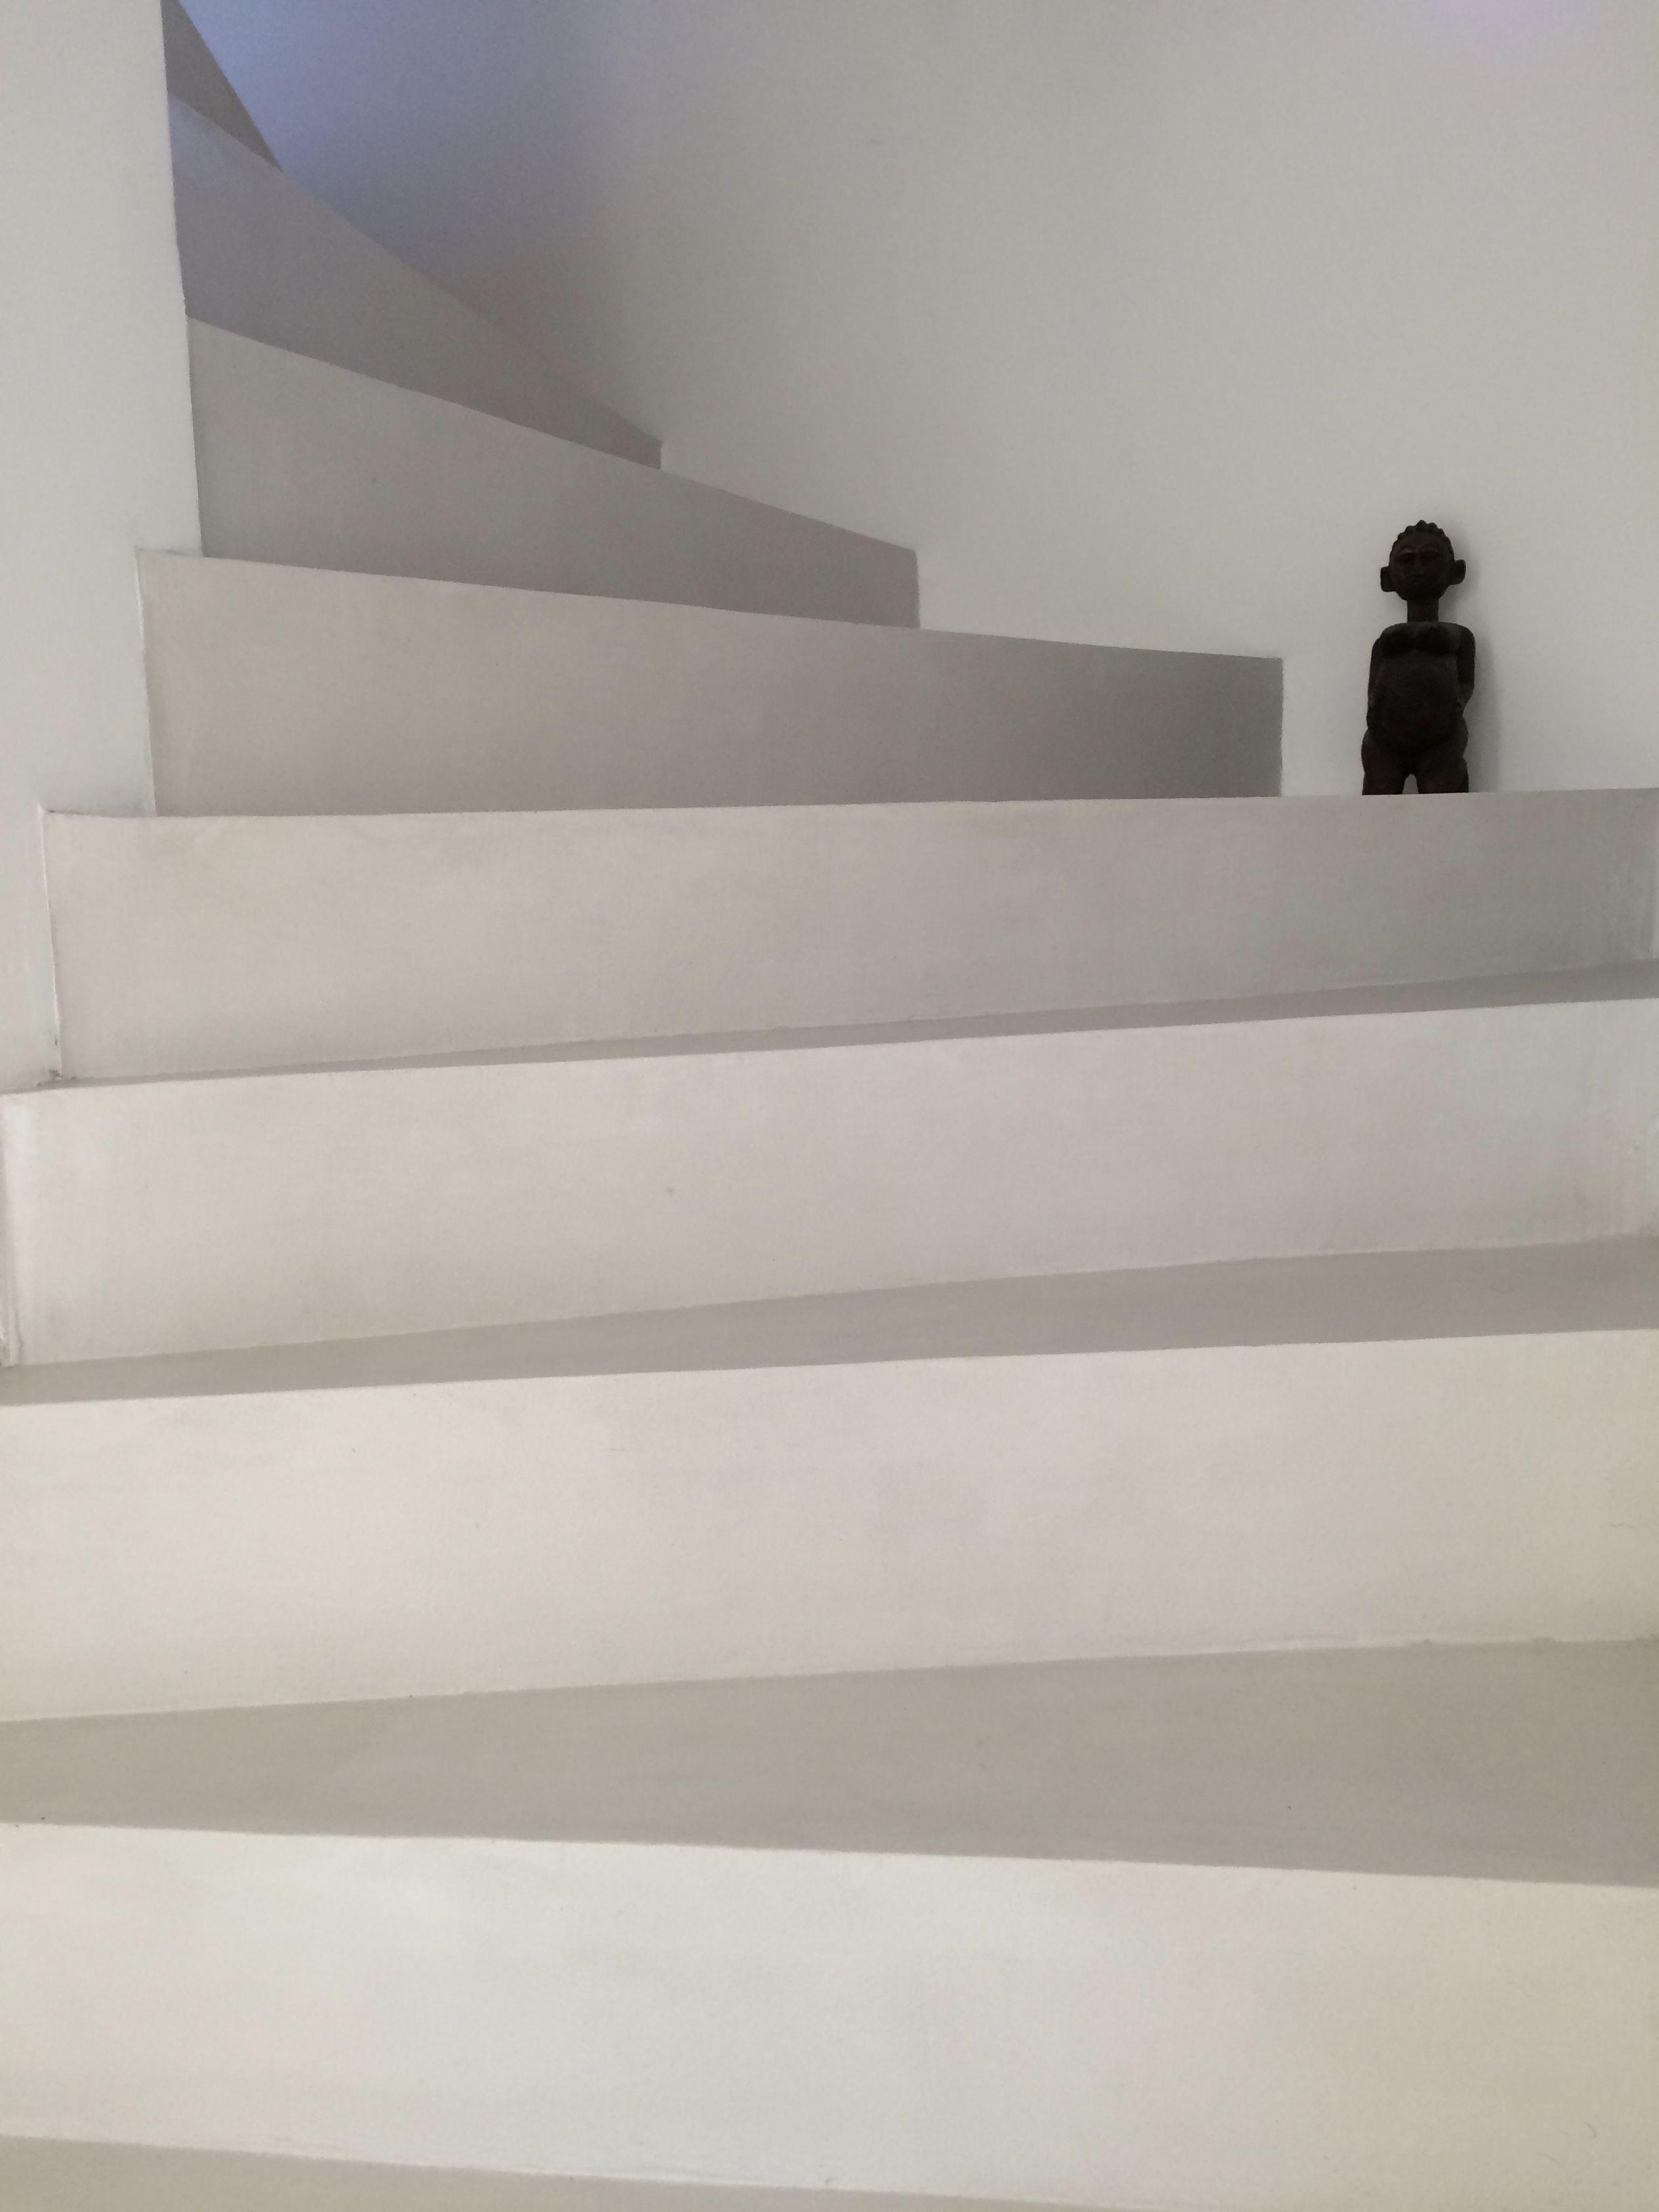 escalier en b ton cir couleur gris cendr ma 39 s b ton cir. Black Bedroom Furniture Sets. Home Design Ideas